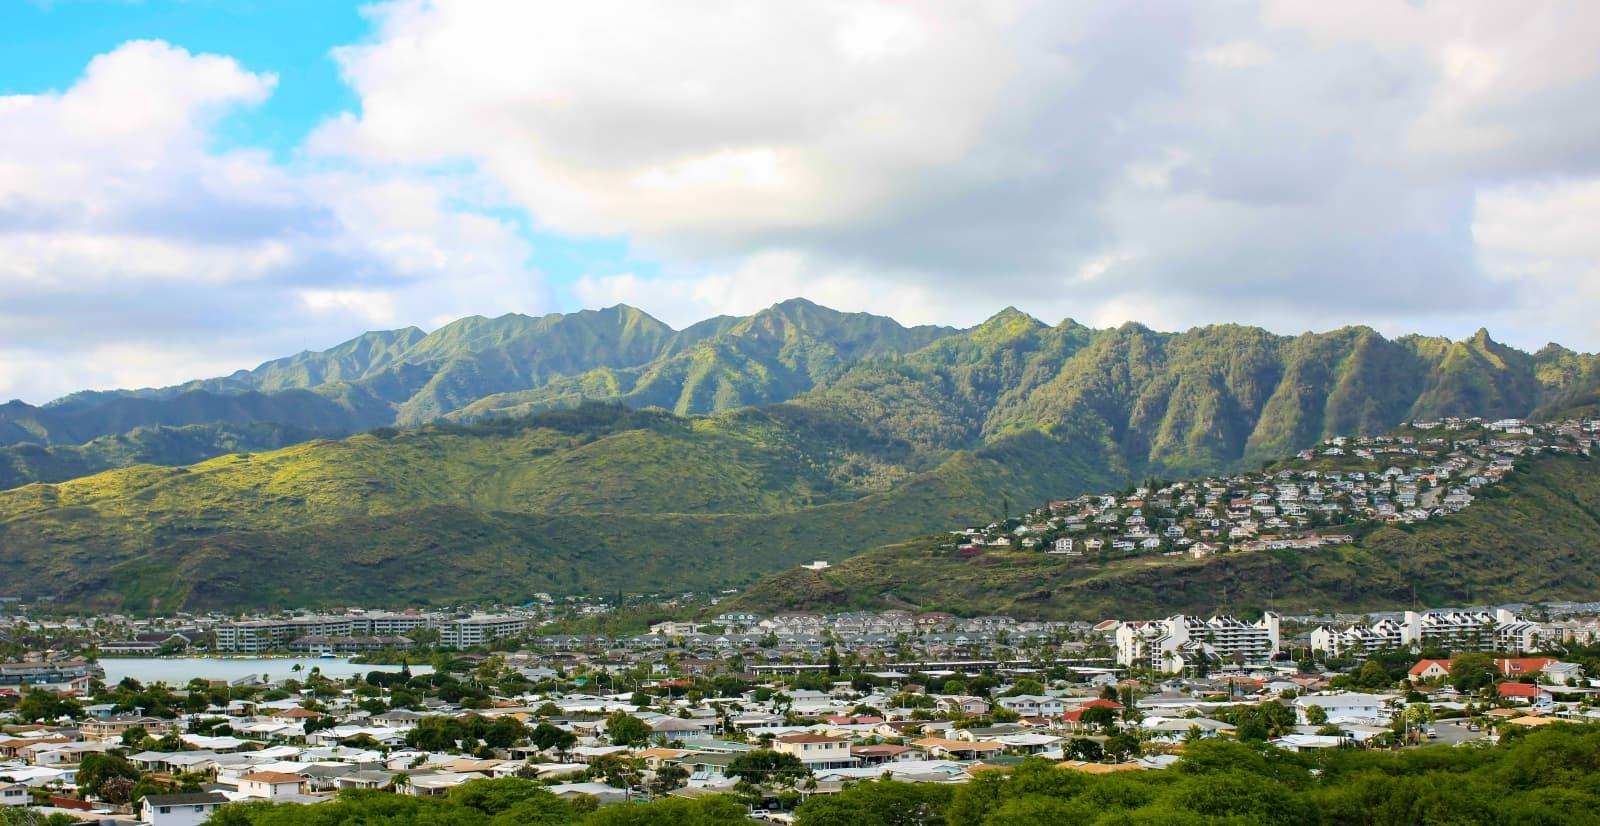 Aerial shot overlooking Hawaii Kai and the Mariners Ridge neighborhood